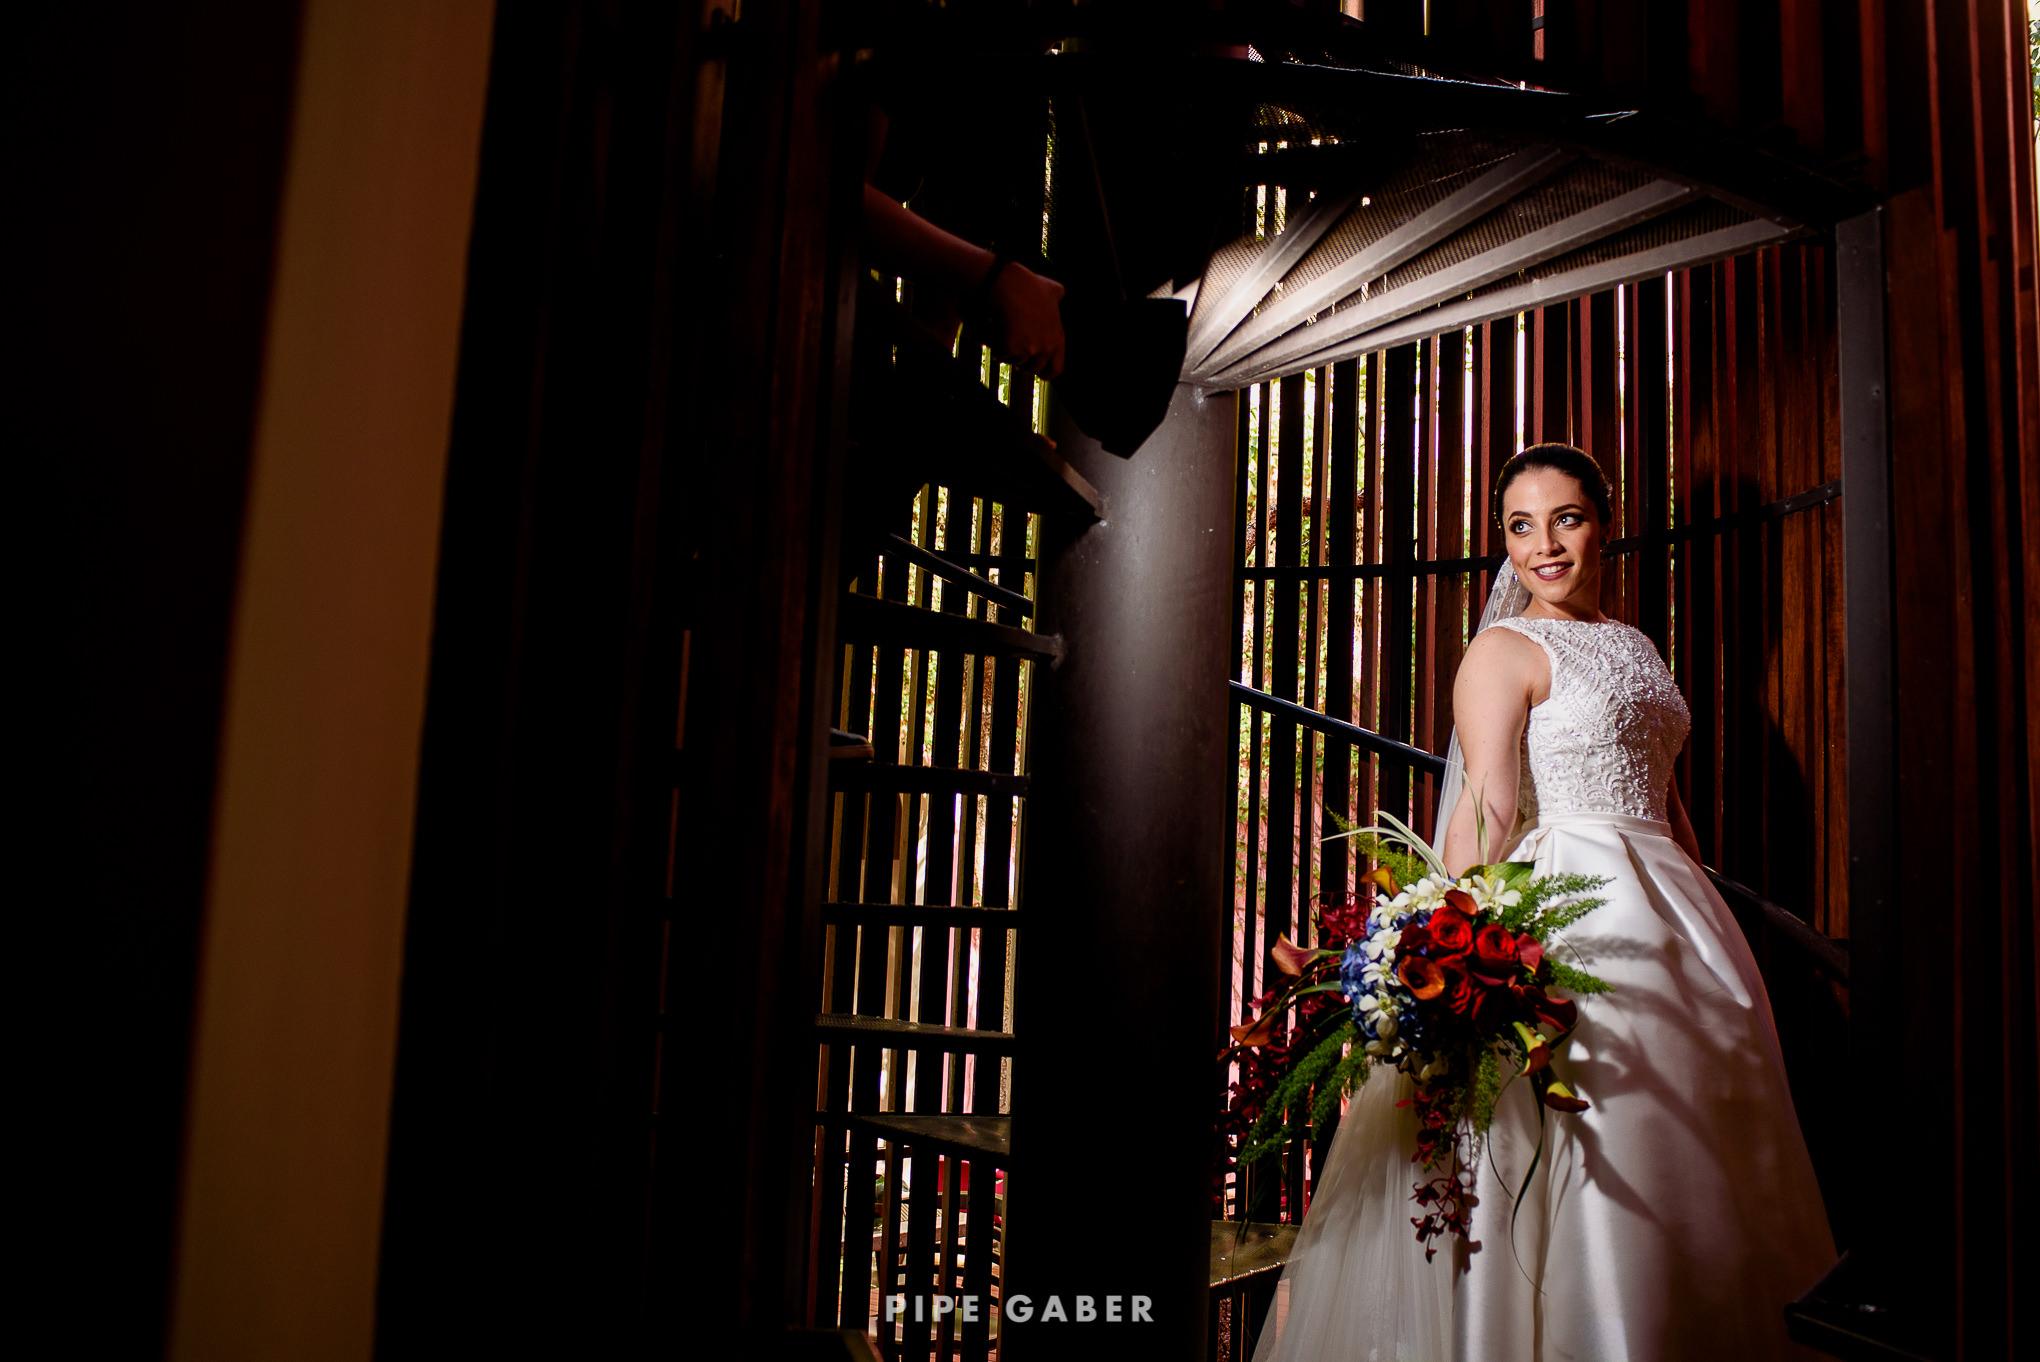 17_02_18_WEDDING_AIDITA_NEZBIT_MIGUEL_DOGRE_33_web.jpg